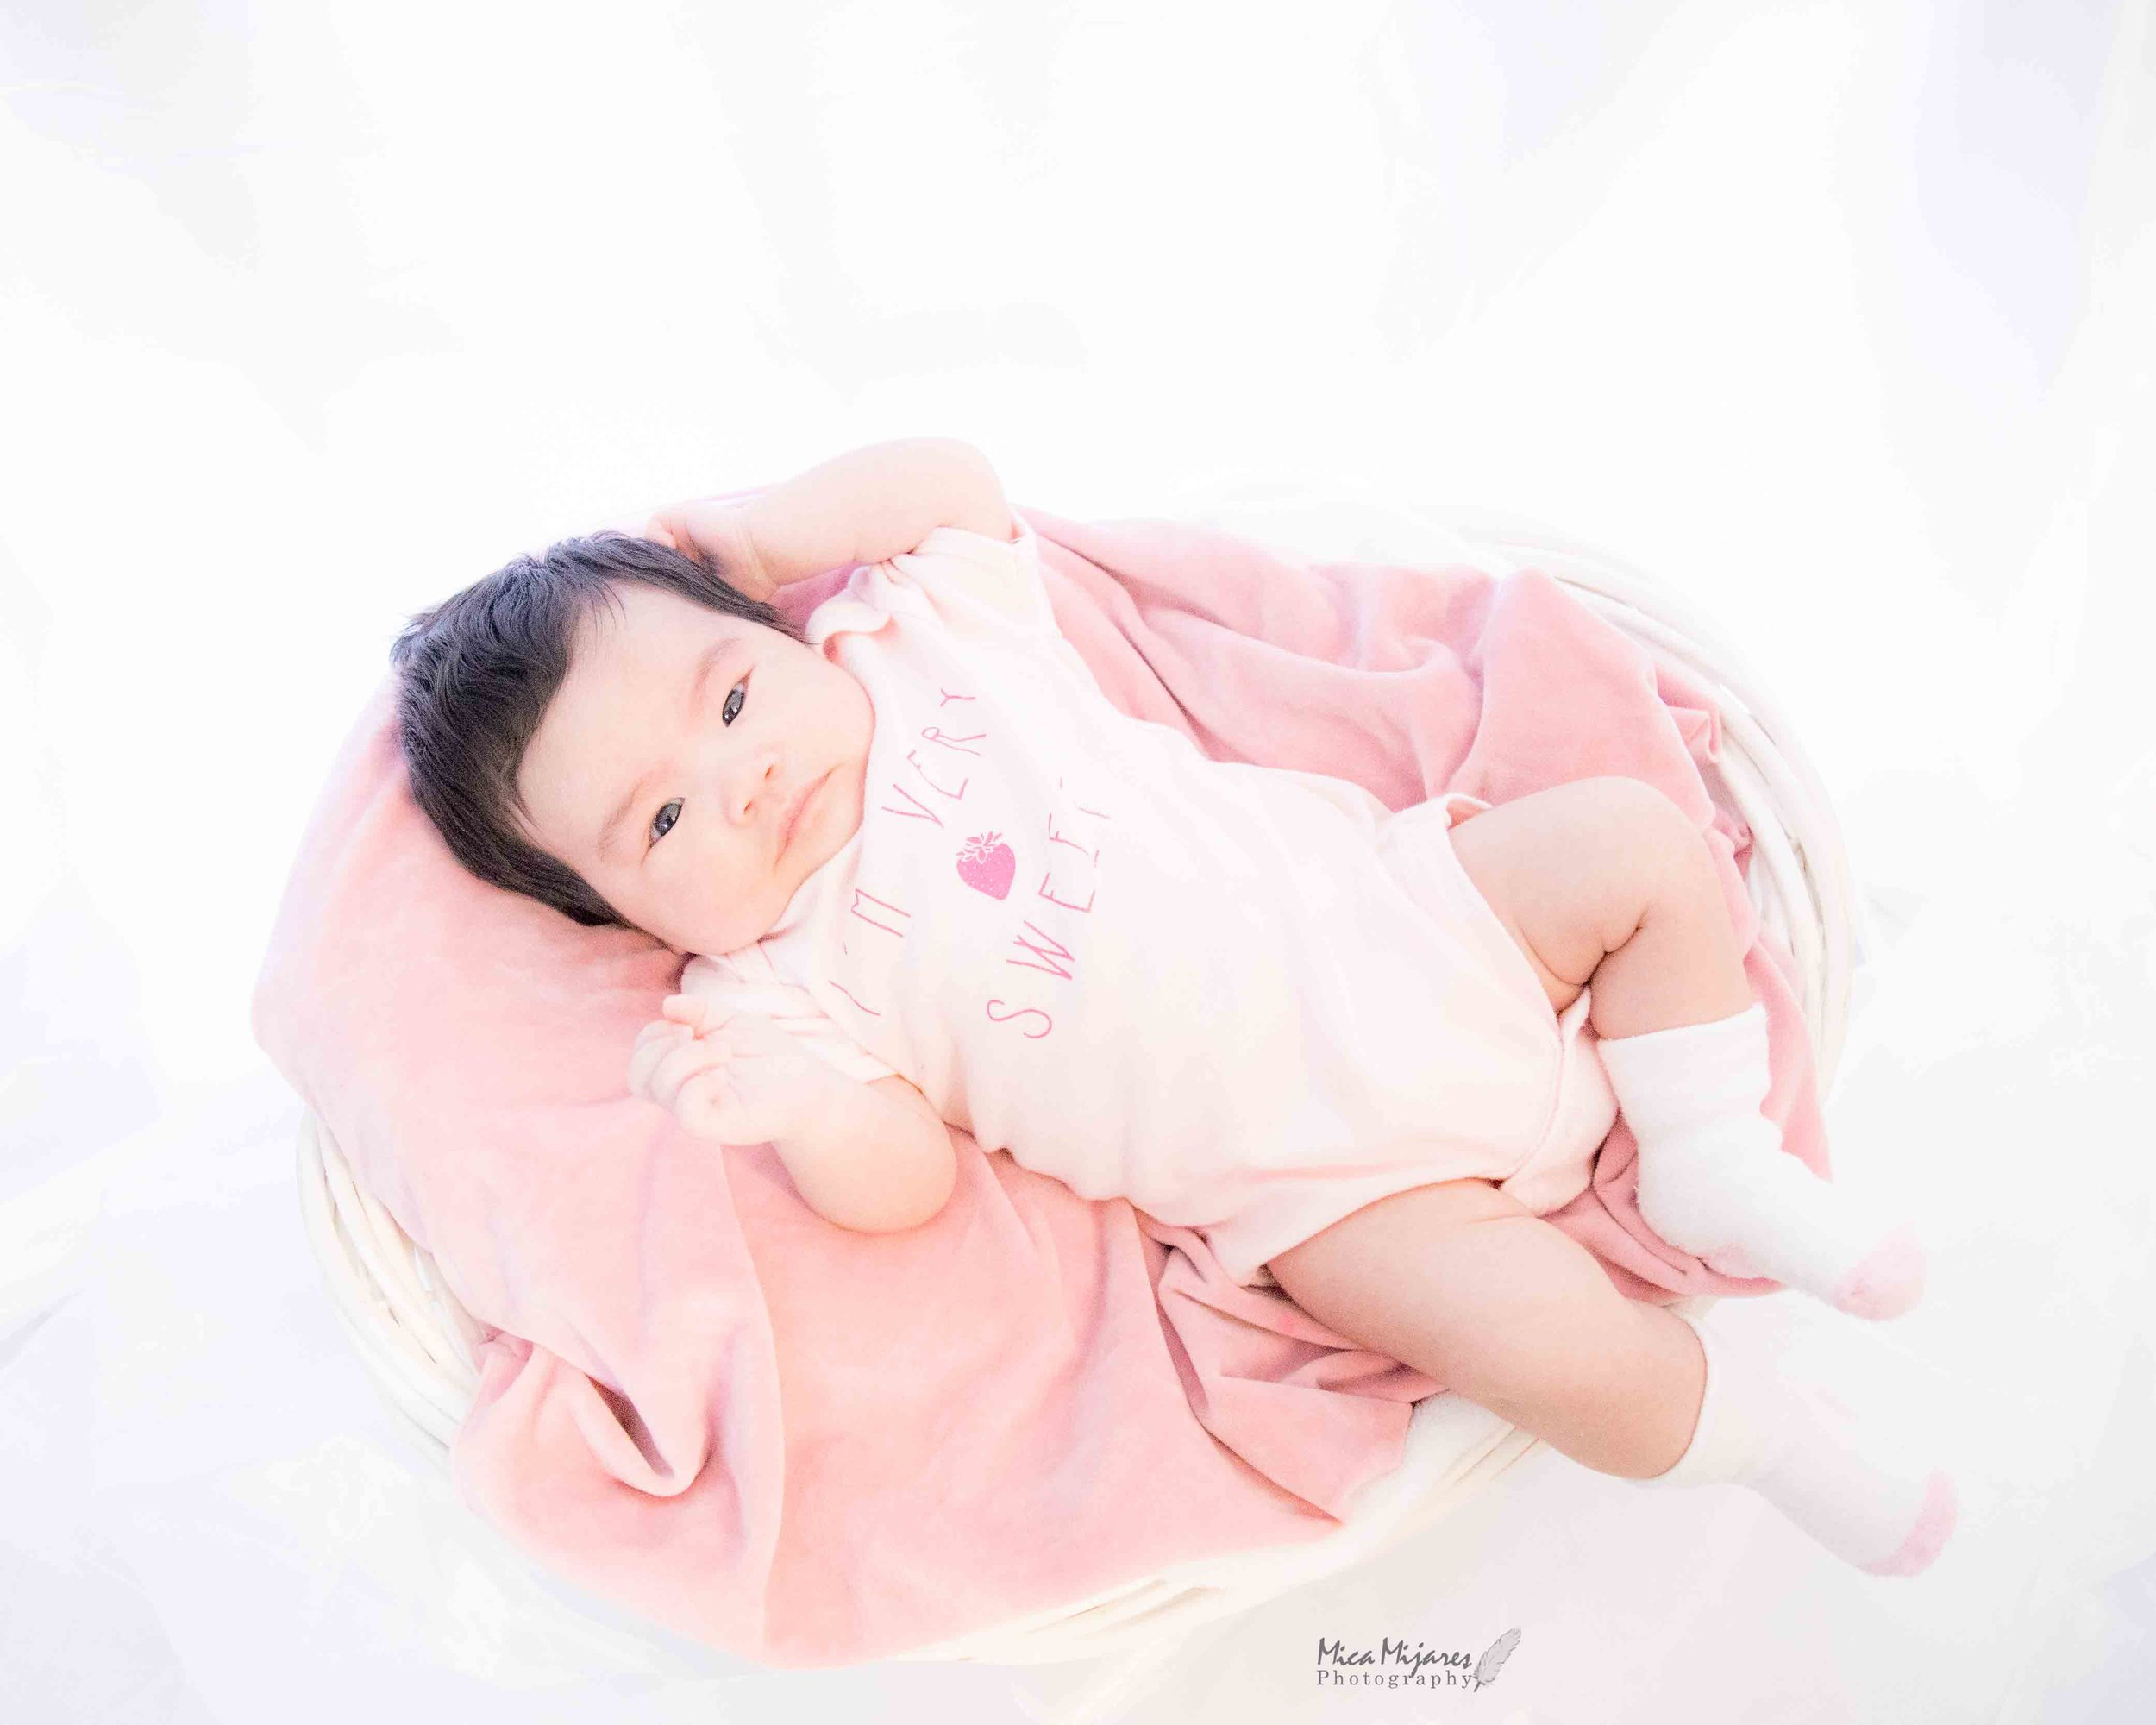 rileyfaith-BabyPhotography-MicaMijaresPhotography (26 of 27).jpg